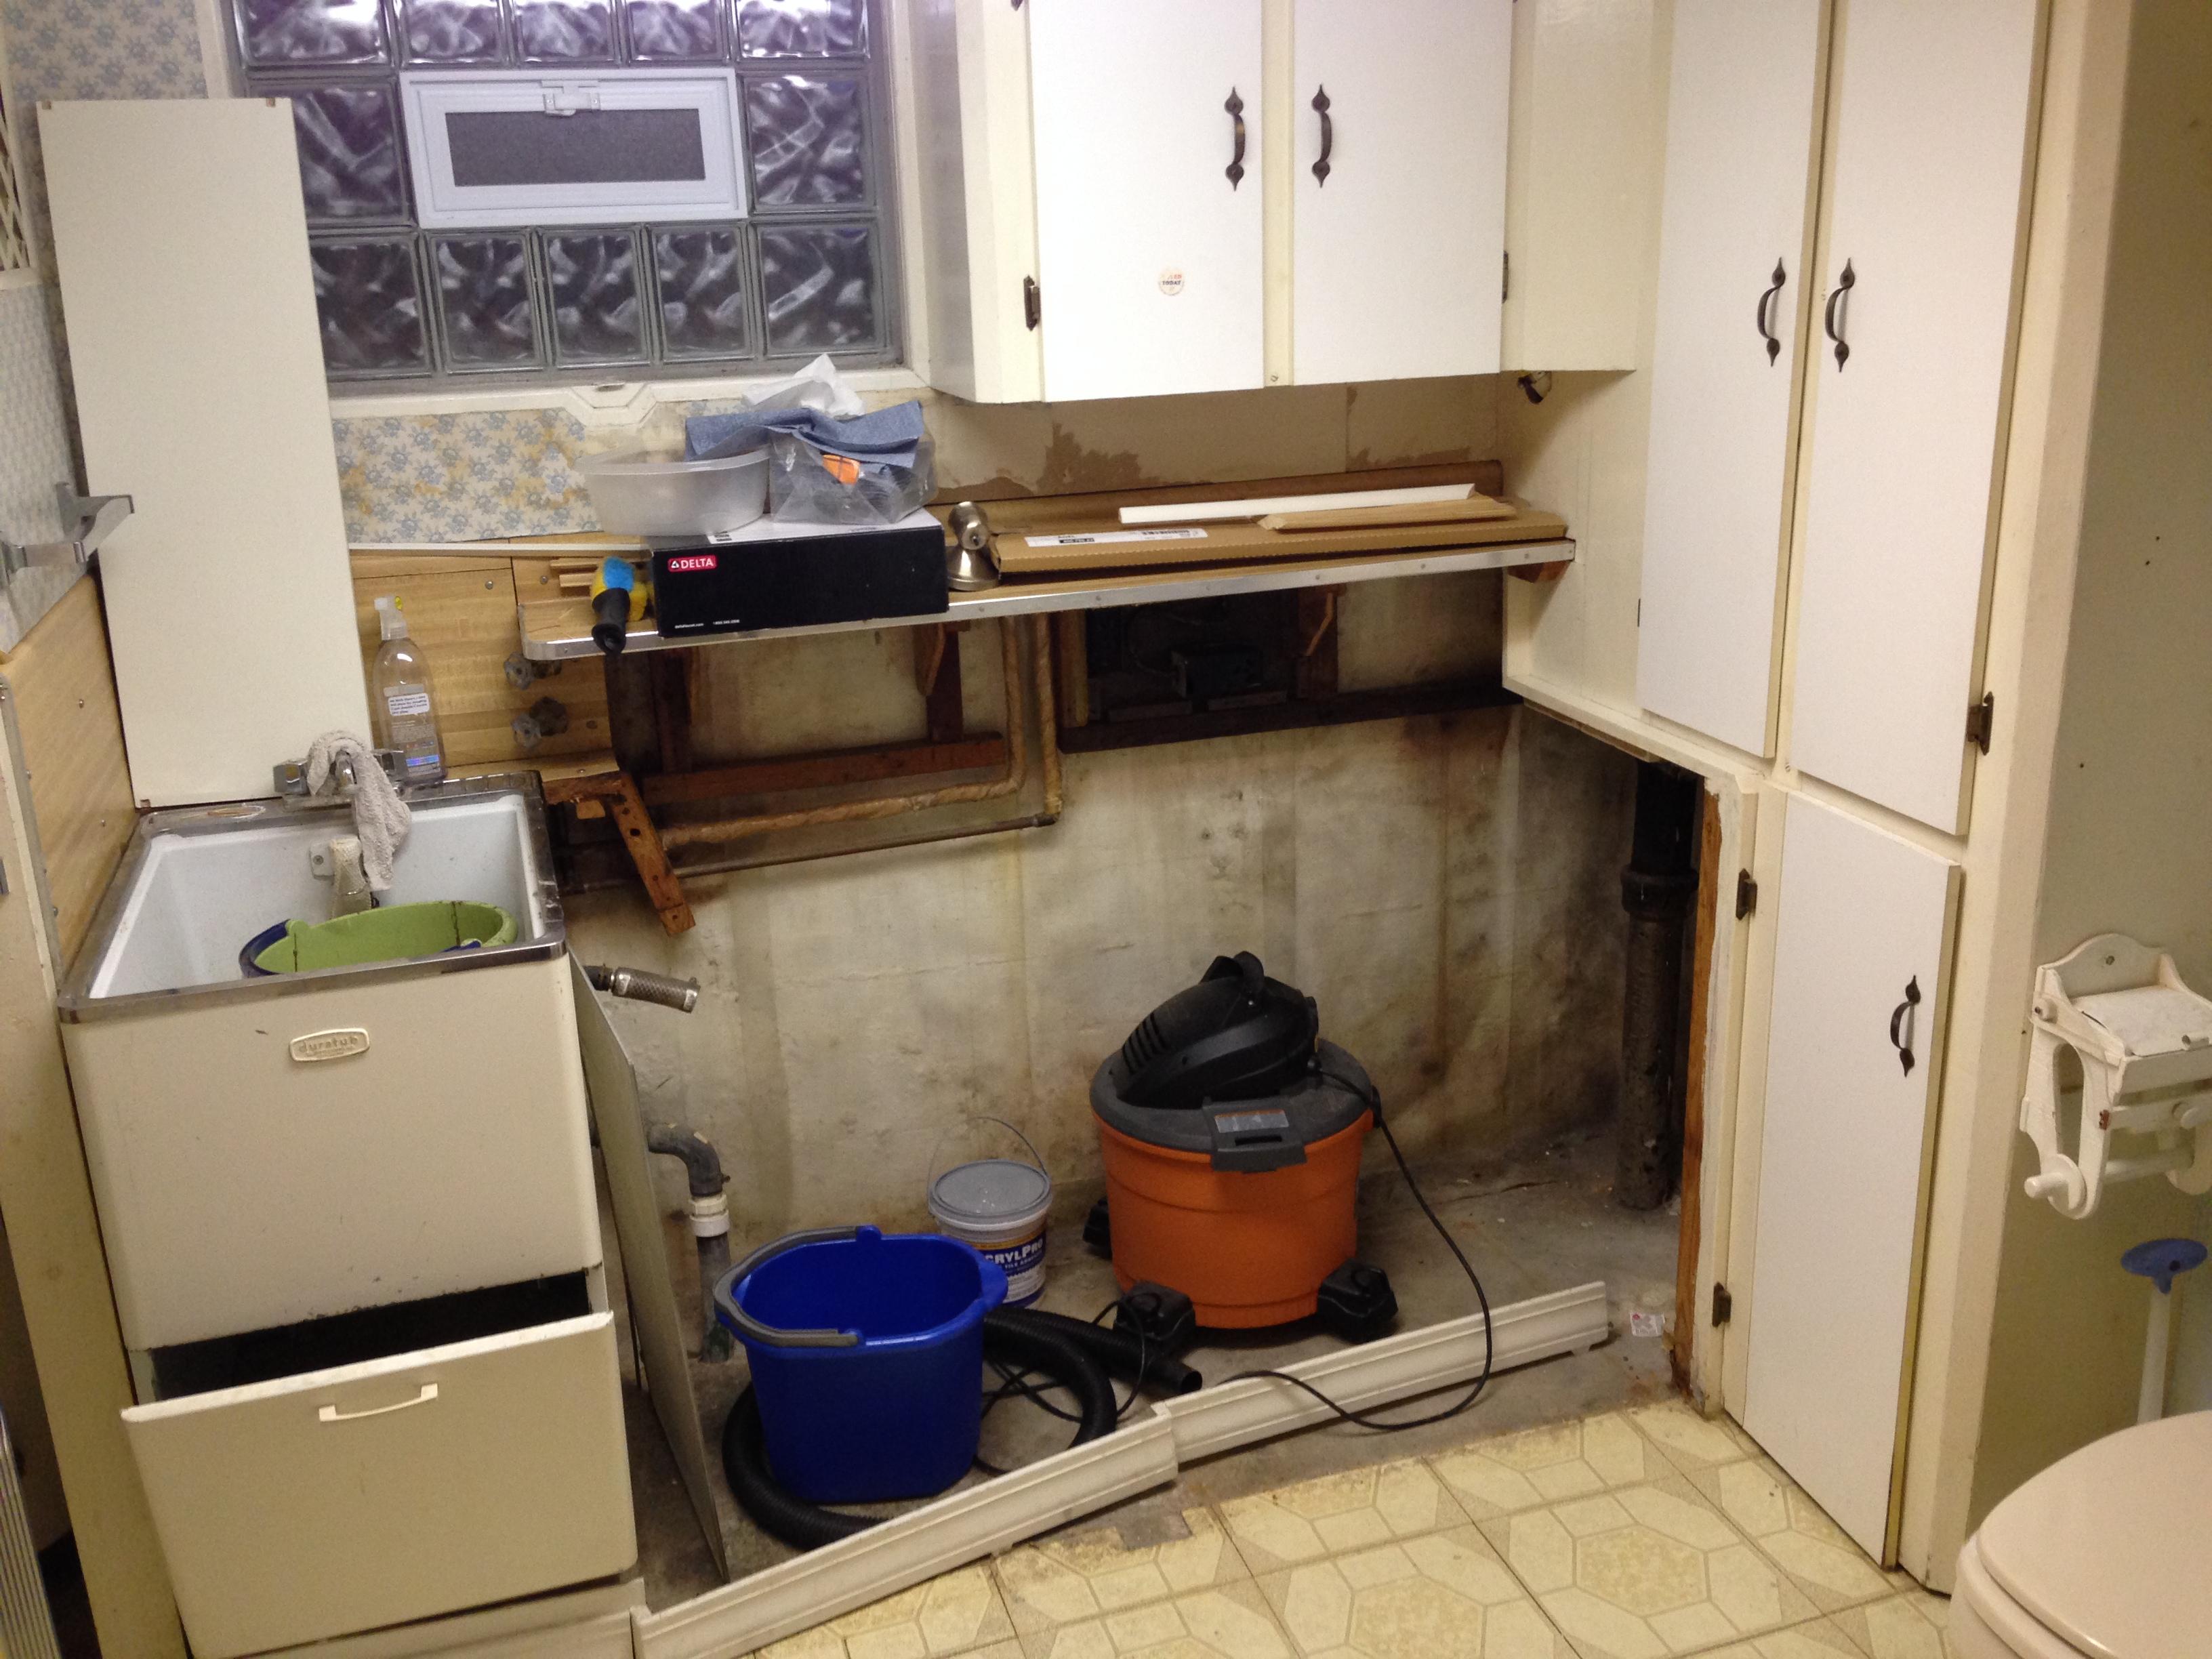 DIYs Sledgehammer Features 13 Area Homes WVXU